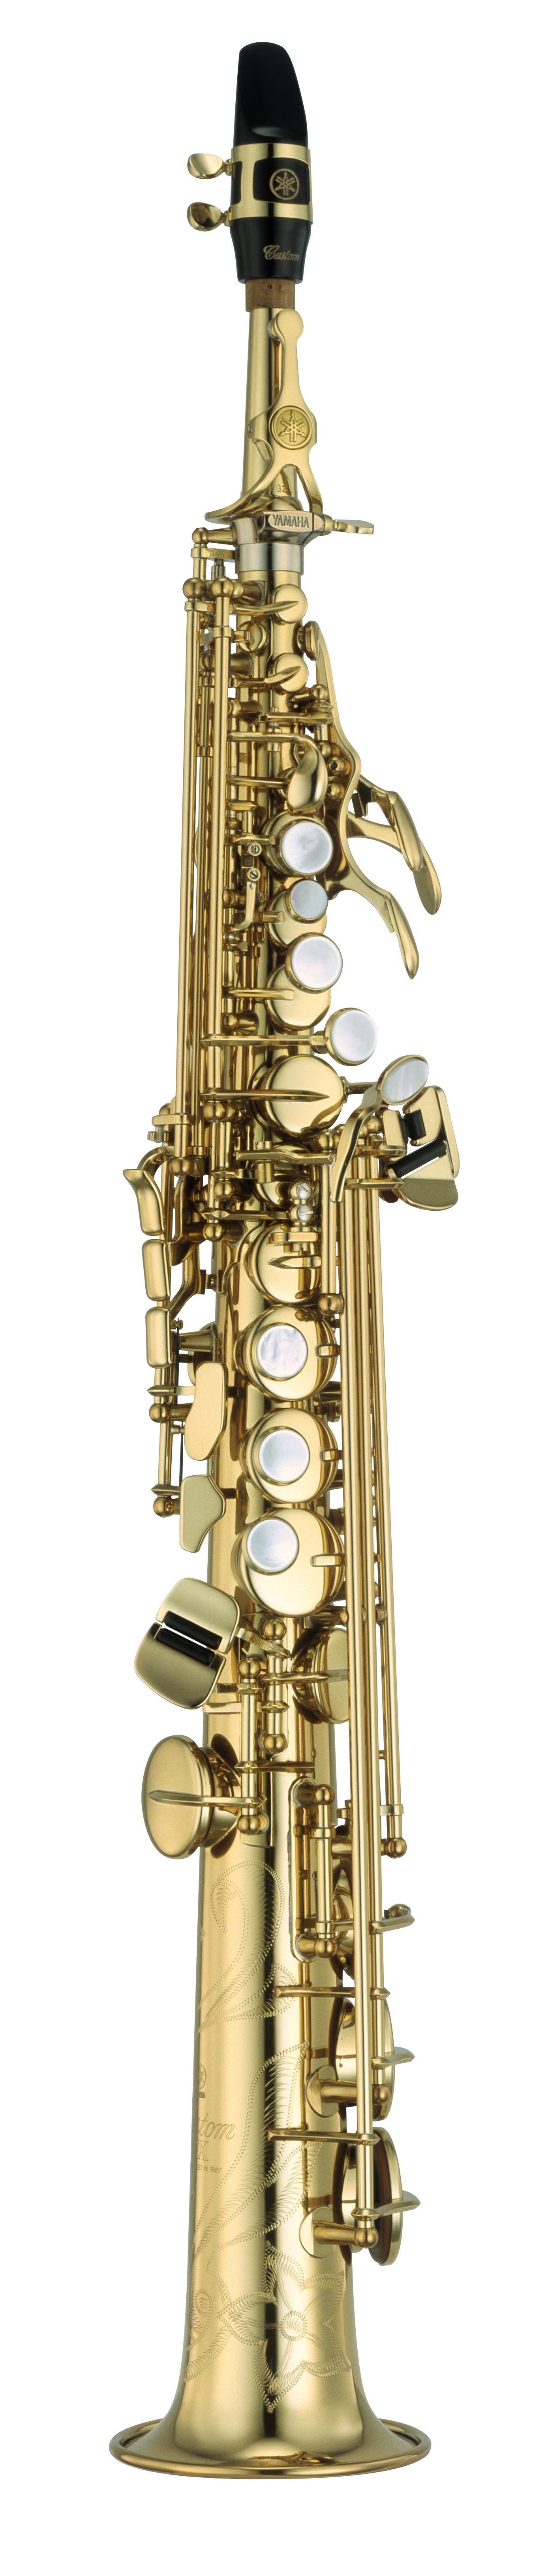 Yamaha Sax Model Numbers